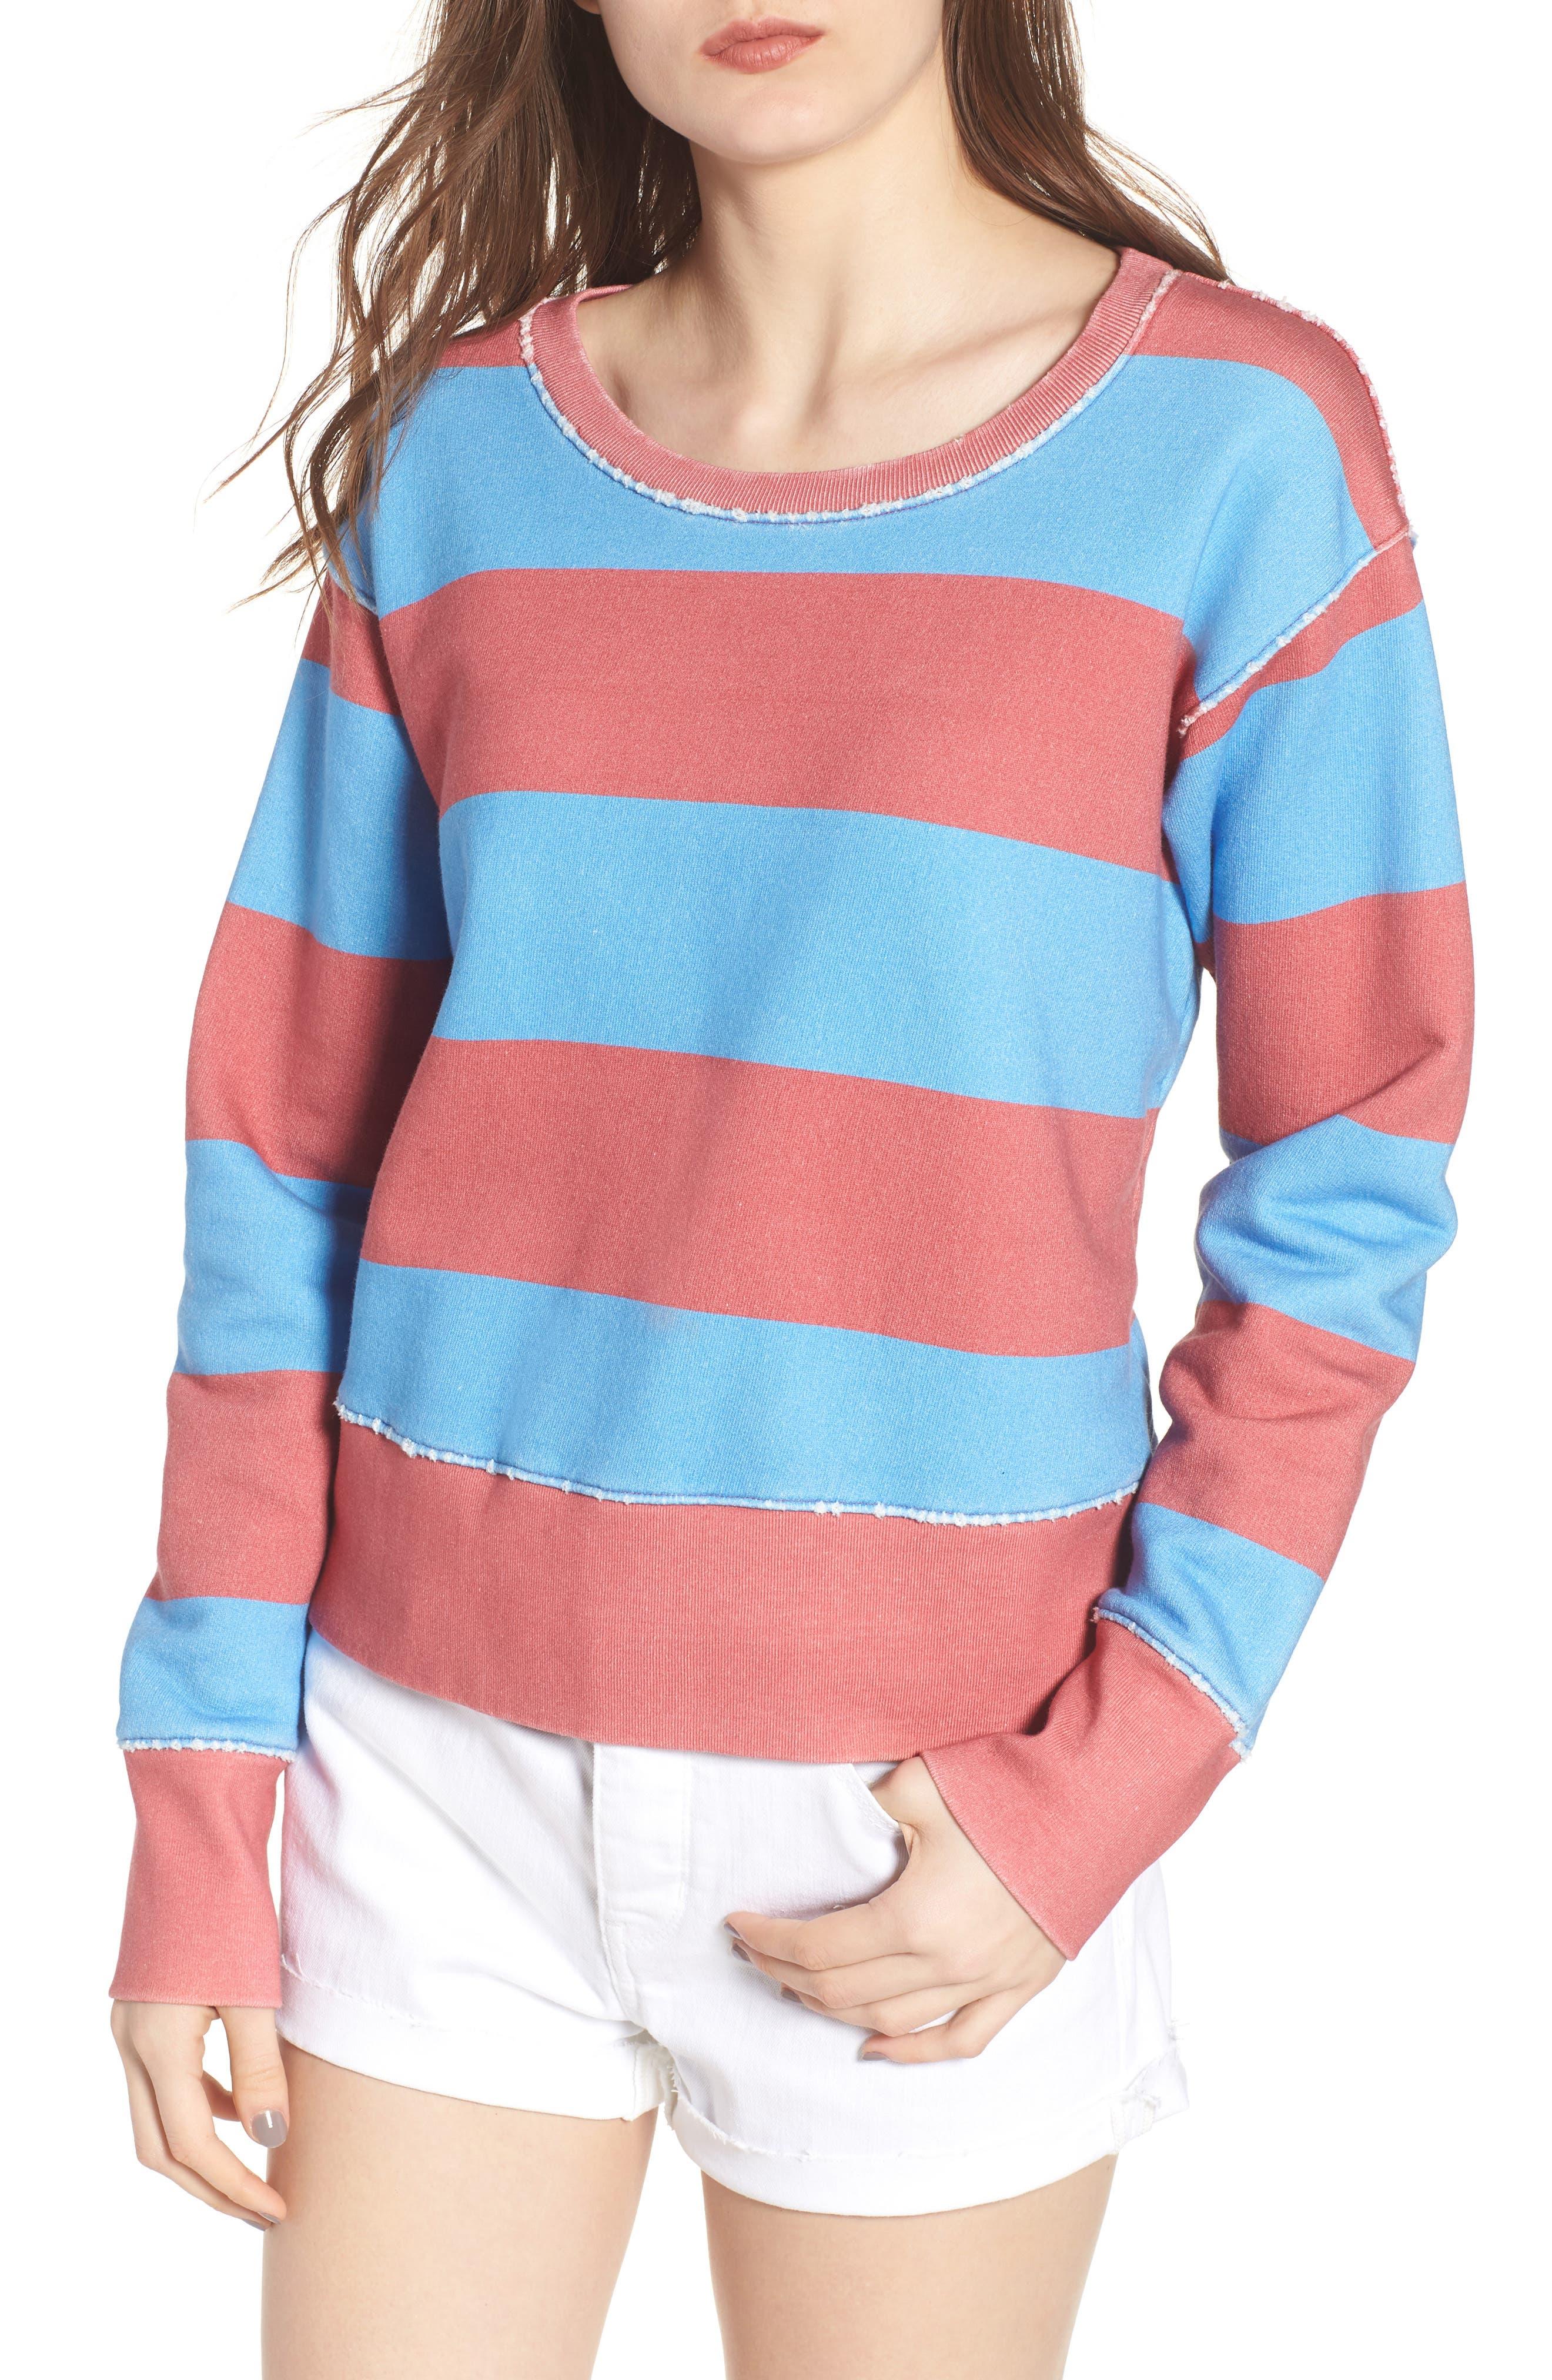 Frank & Eileen Tee Lab Stripe Crewneck Sweatshirt